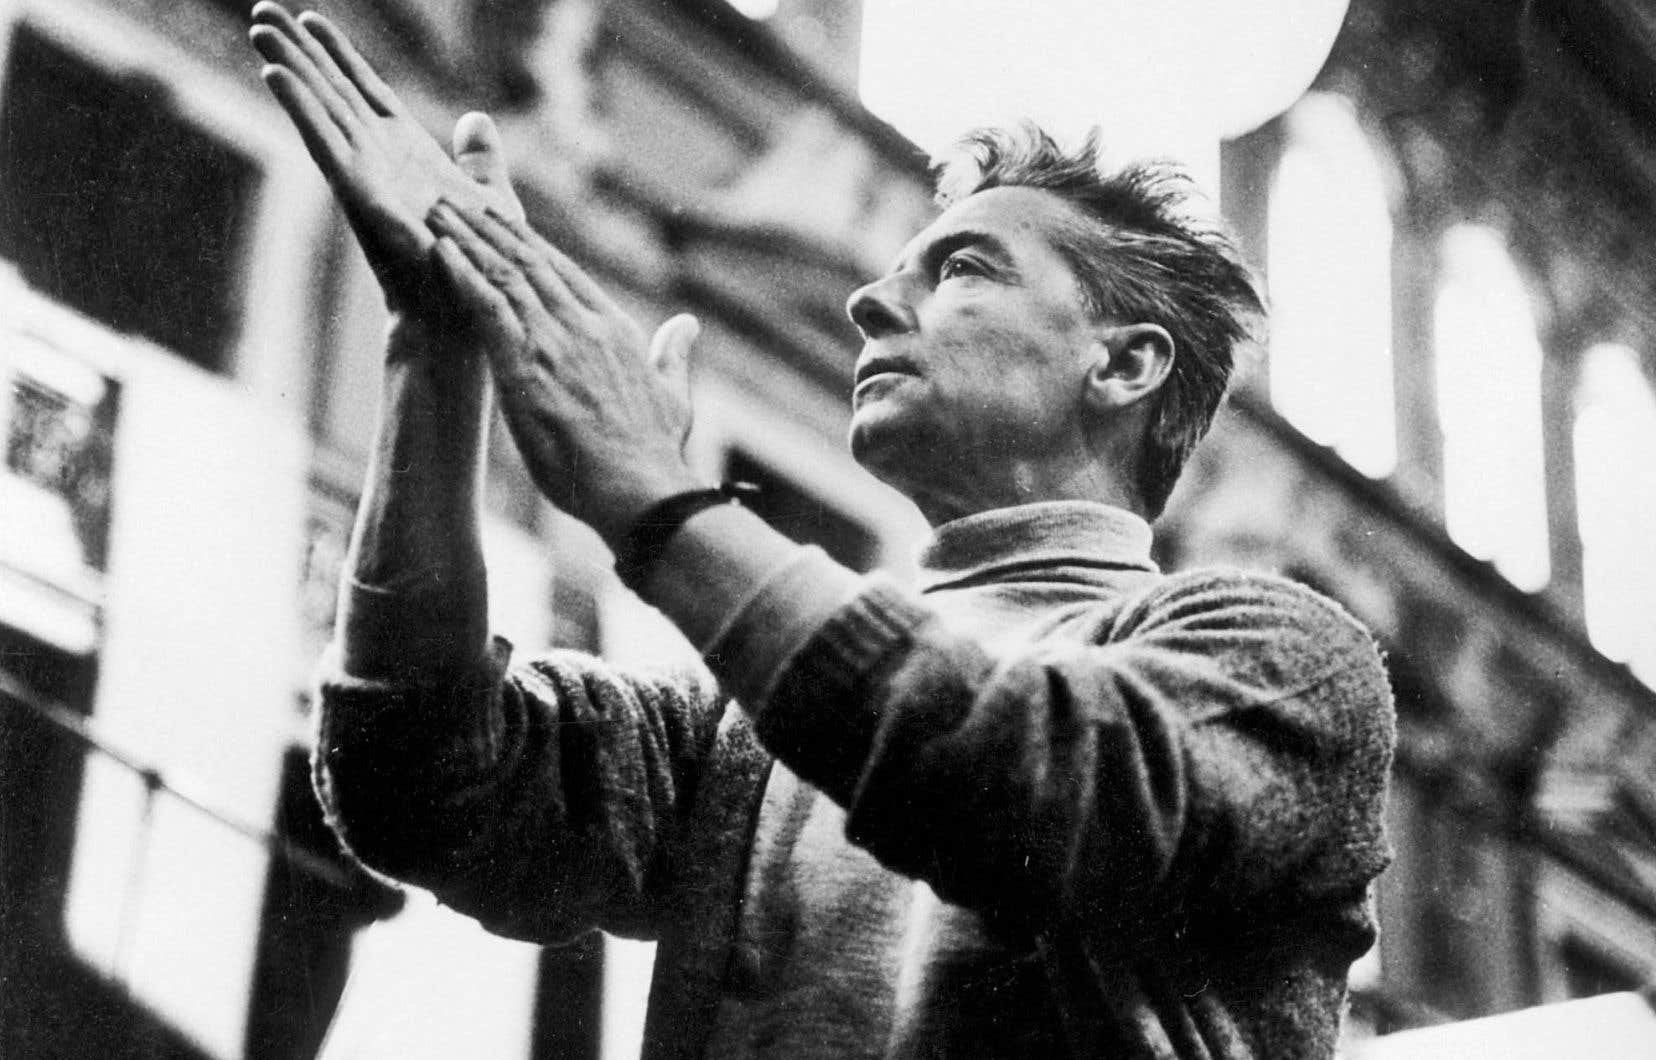 Le chef Herbert von Karajan dirigeant un orchestre à Berlin en 1950